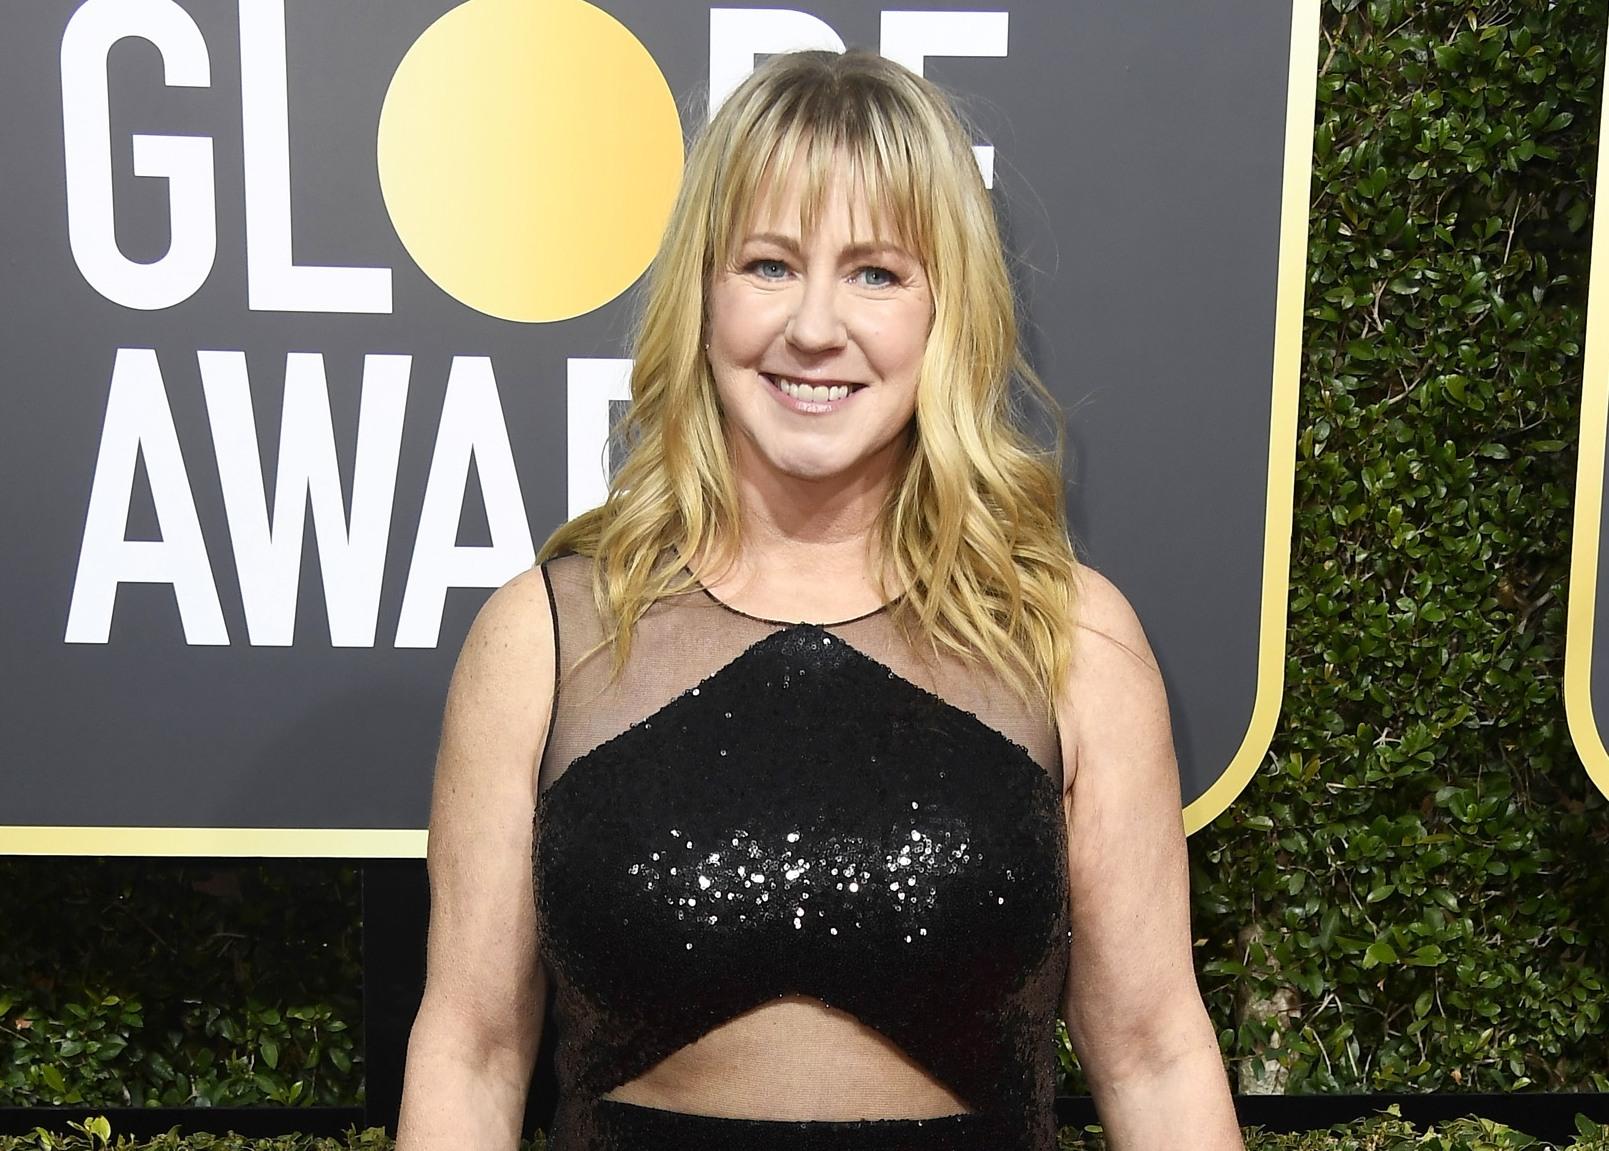 Tonya Harding at the Golden Globes